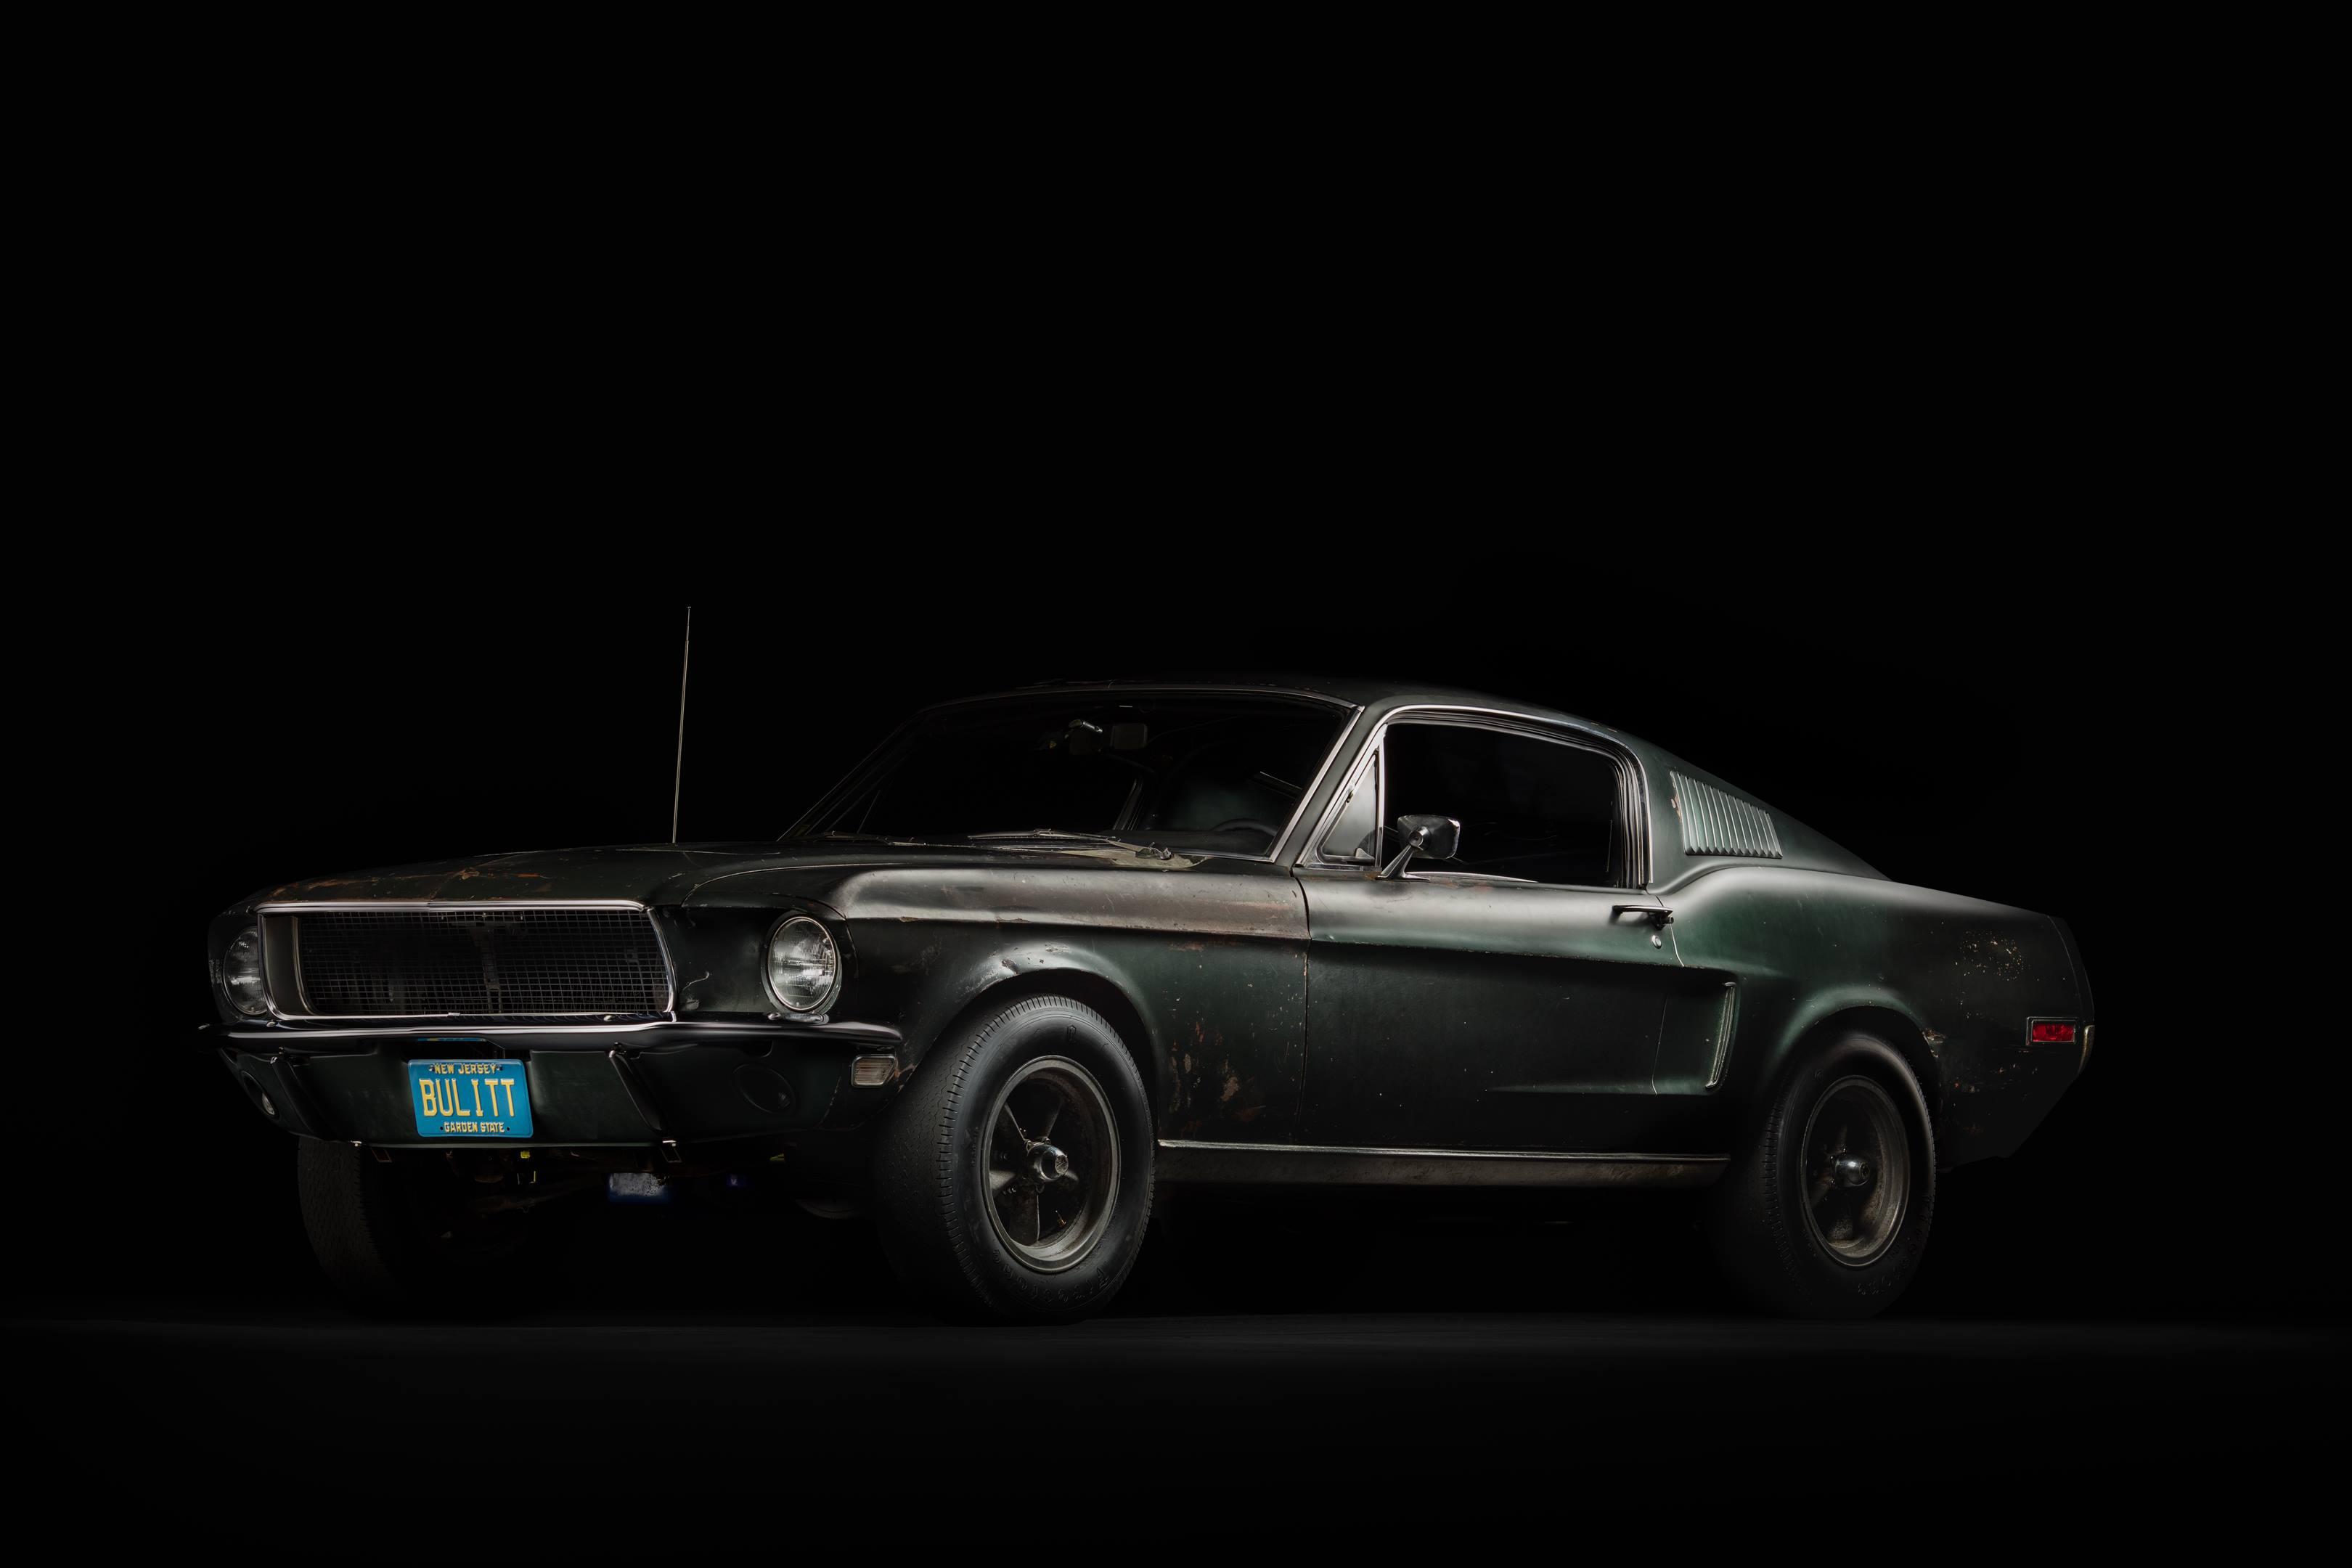 Bullitt Mustang front 3/4